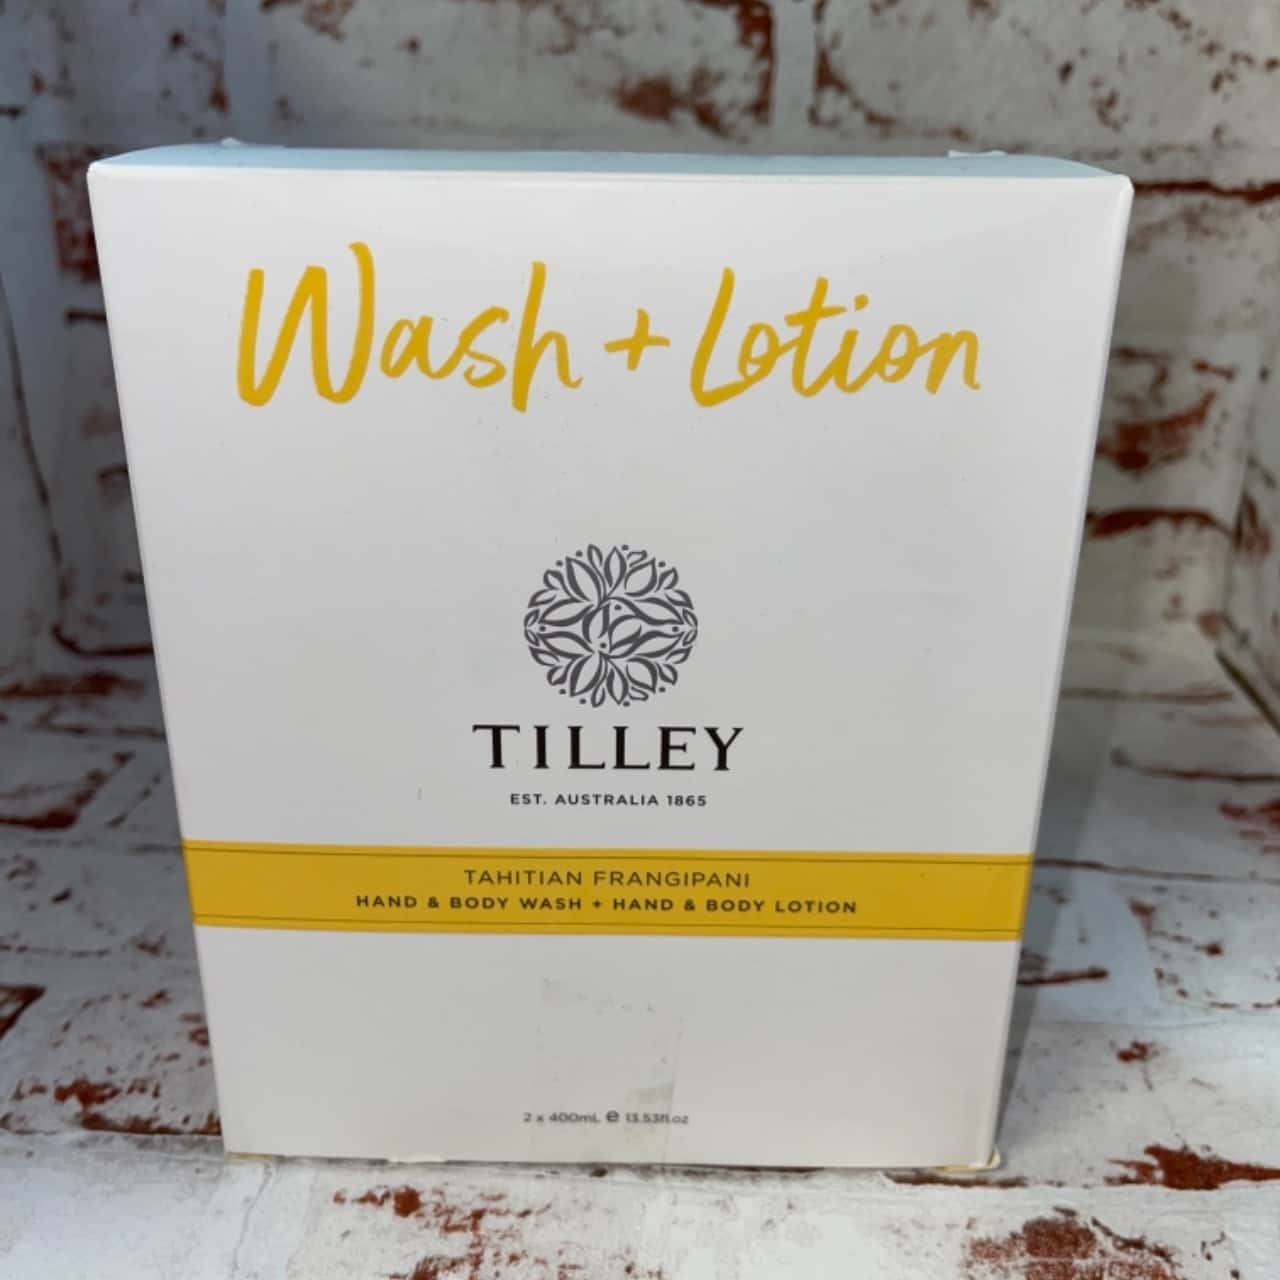 Tillys wash and lotion 2x400ml Tahitian frangipani fragrance